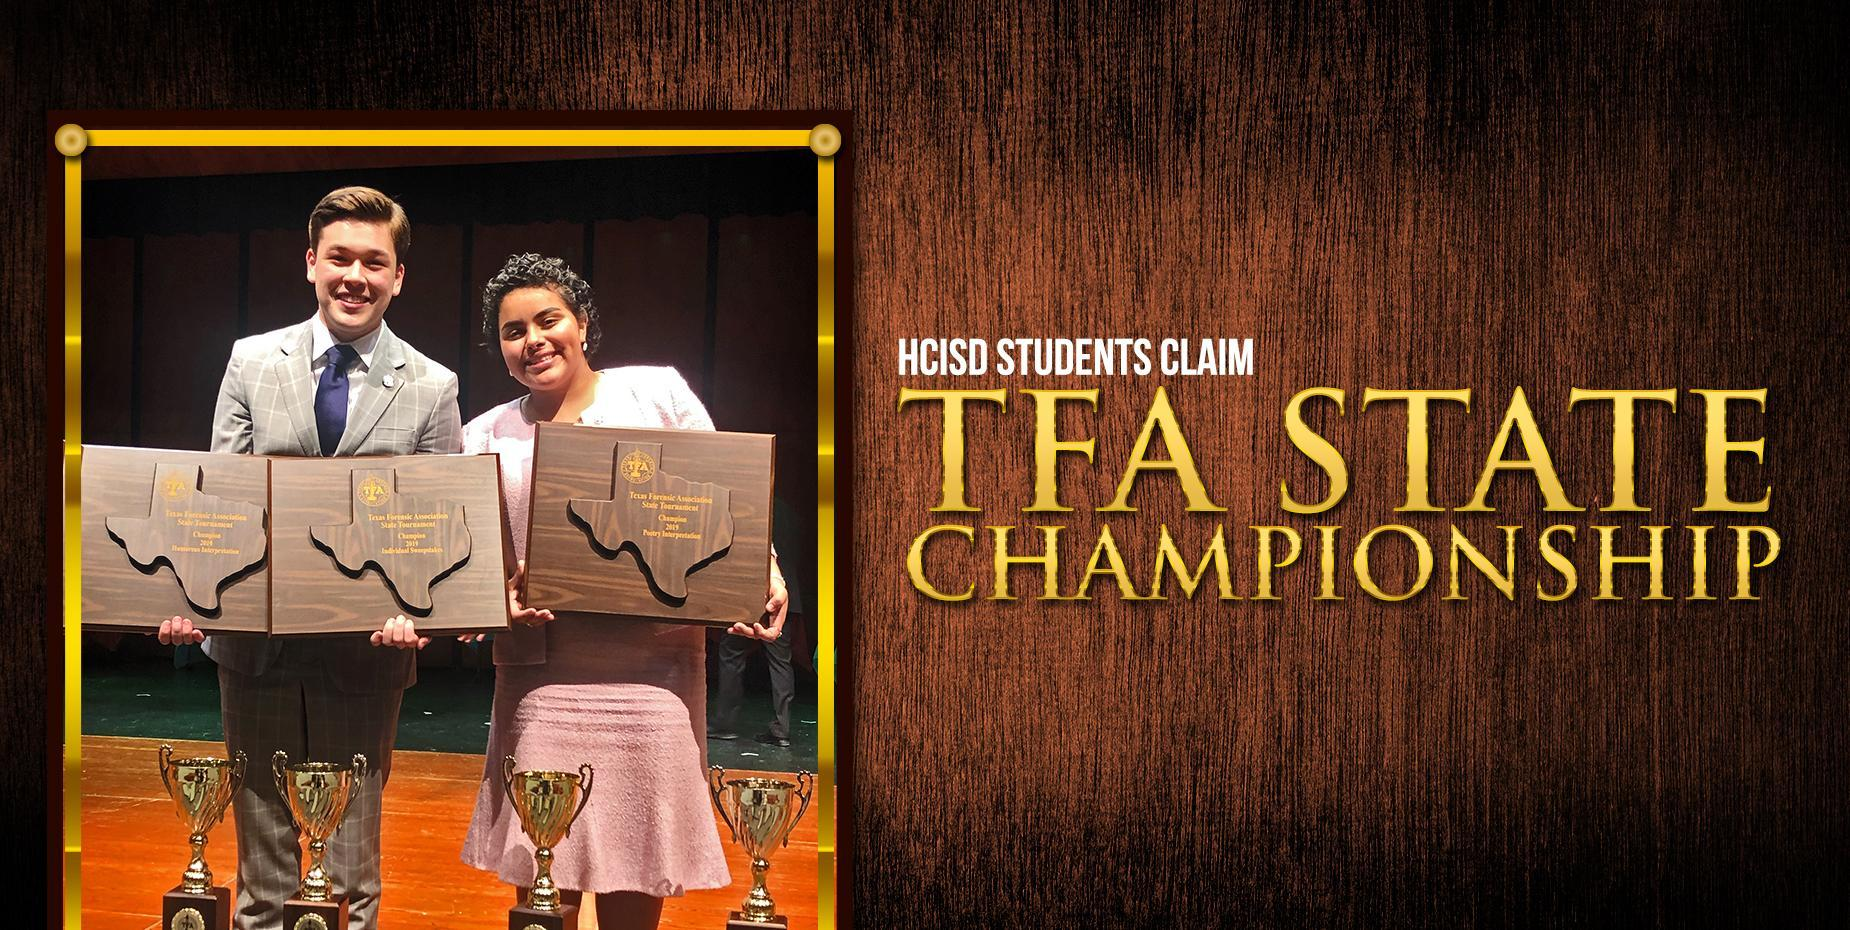 HCISD Students Claim TFA State Championship